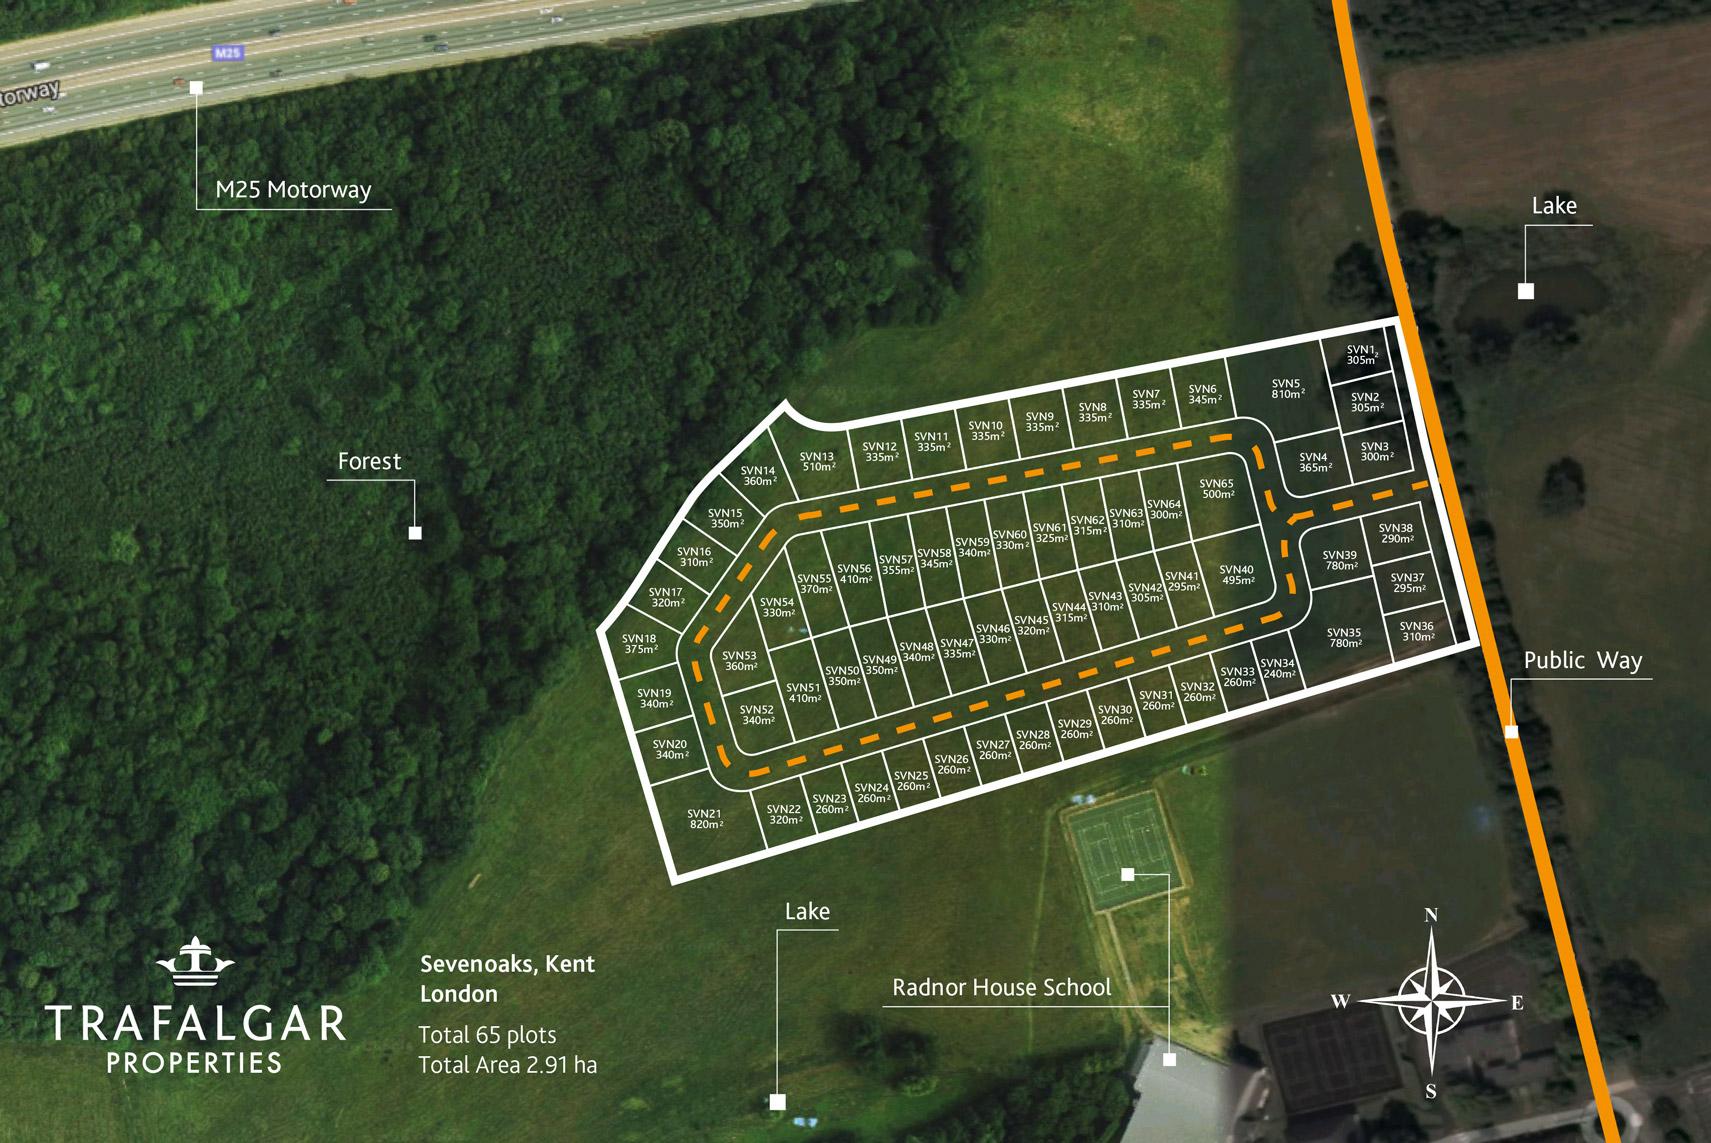 Uk Land For Sale Site Sevenoaks Real Estate Project In